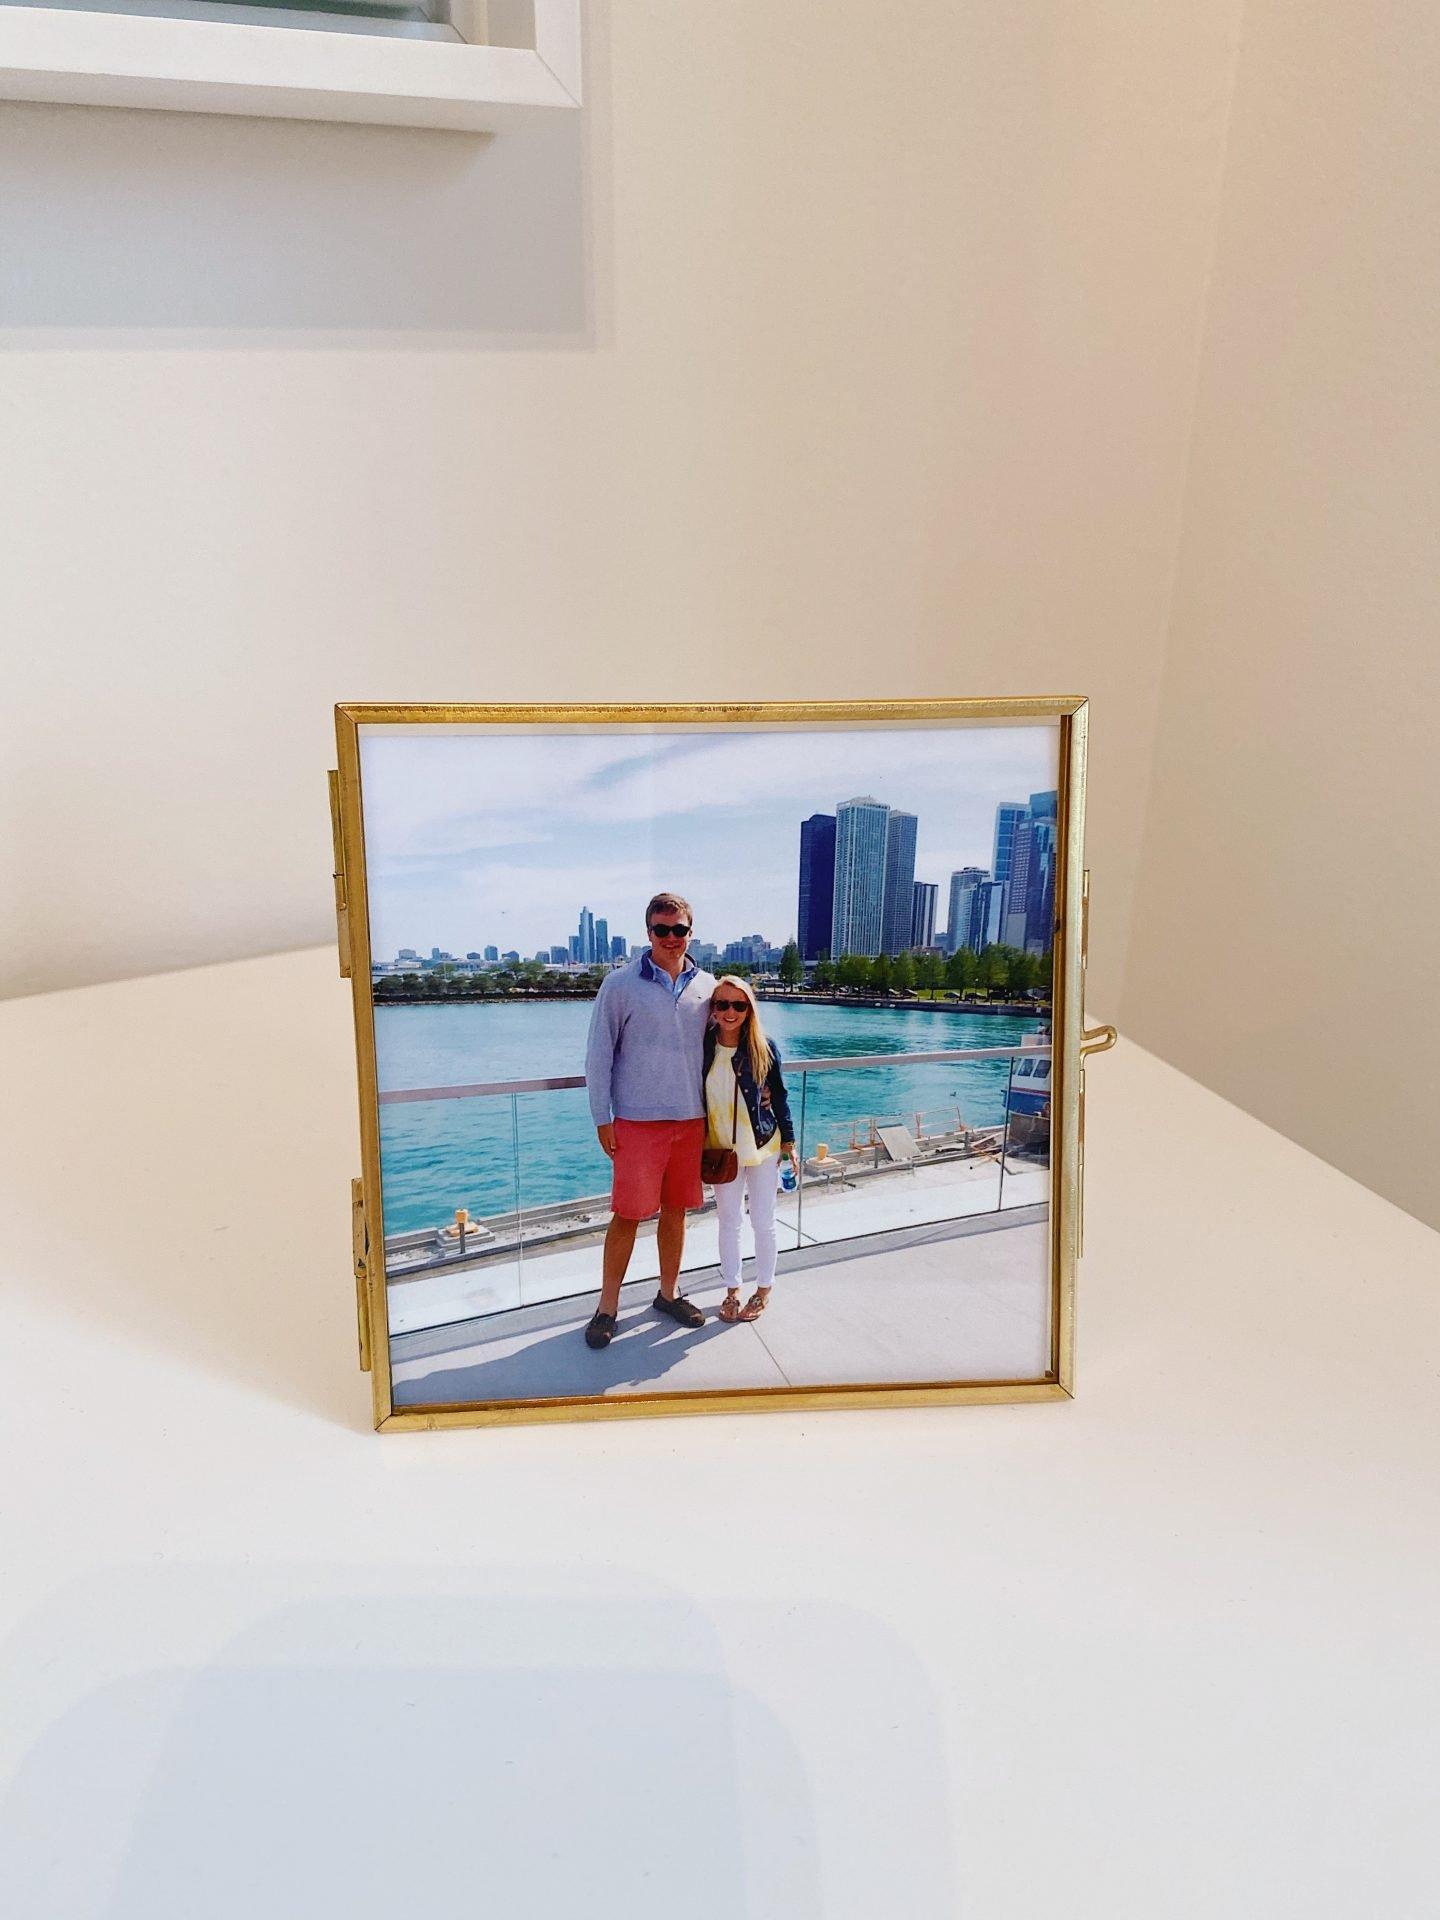 Amazon Prime Home Décor Finds Antique Gold Locket Picture Frame